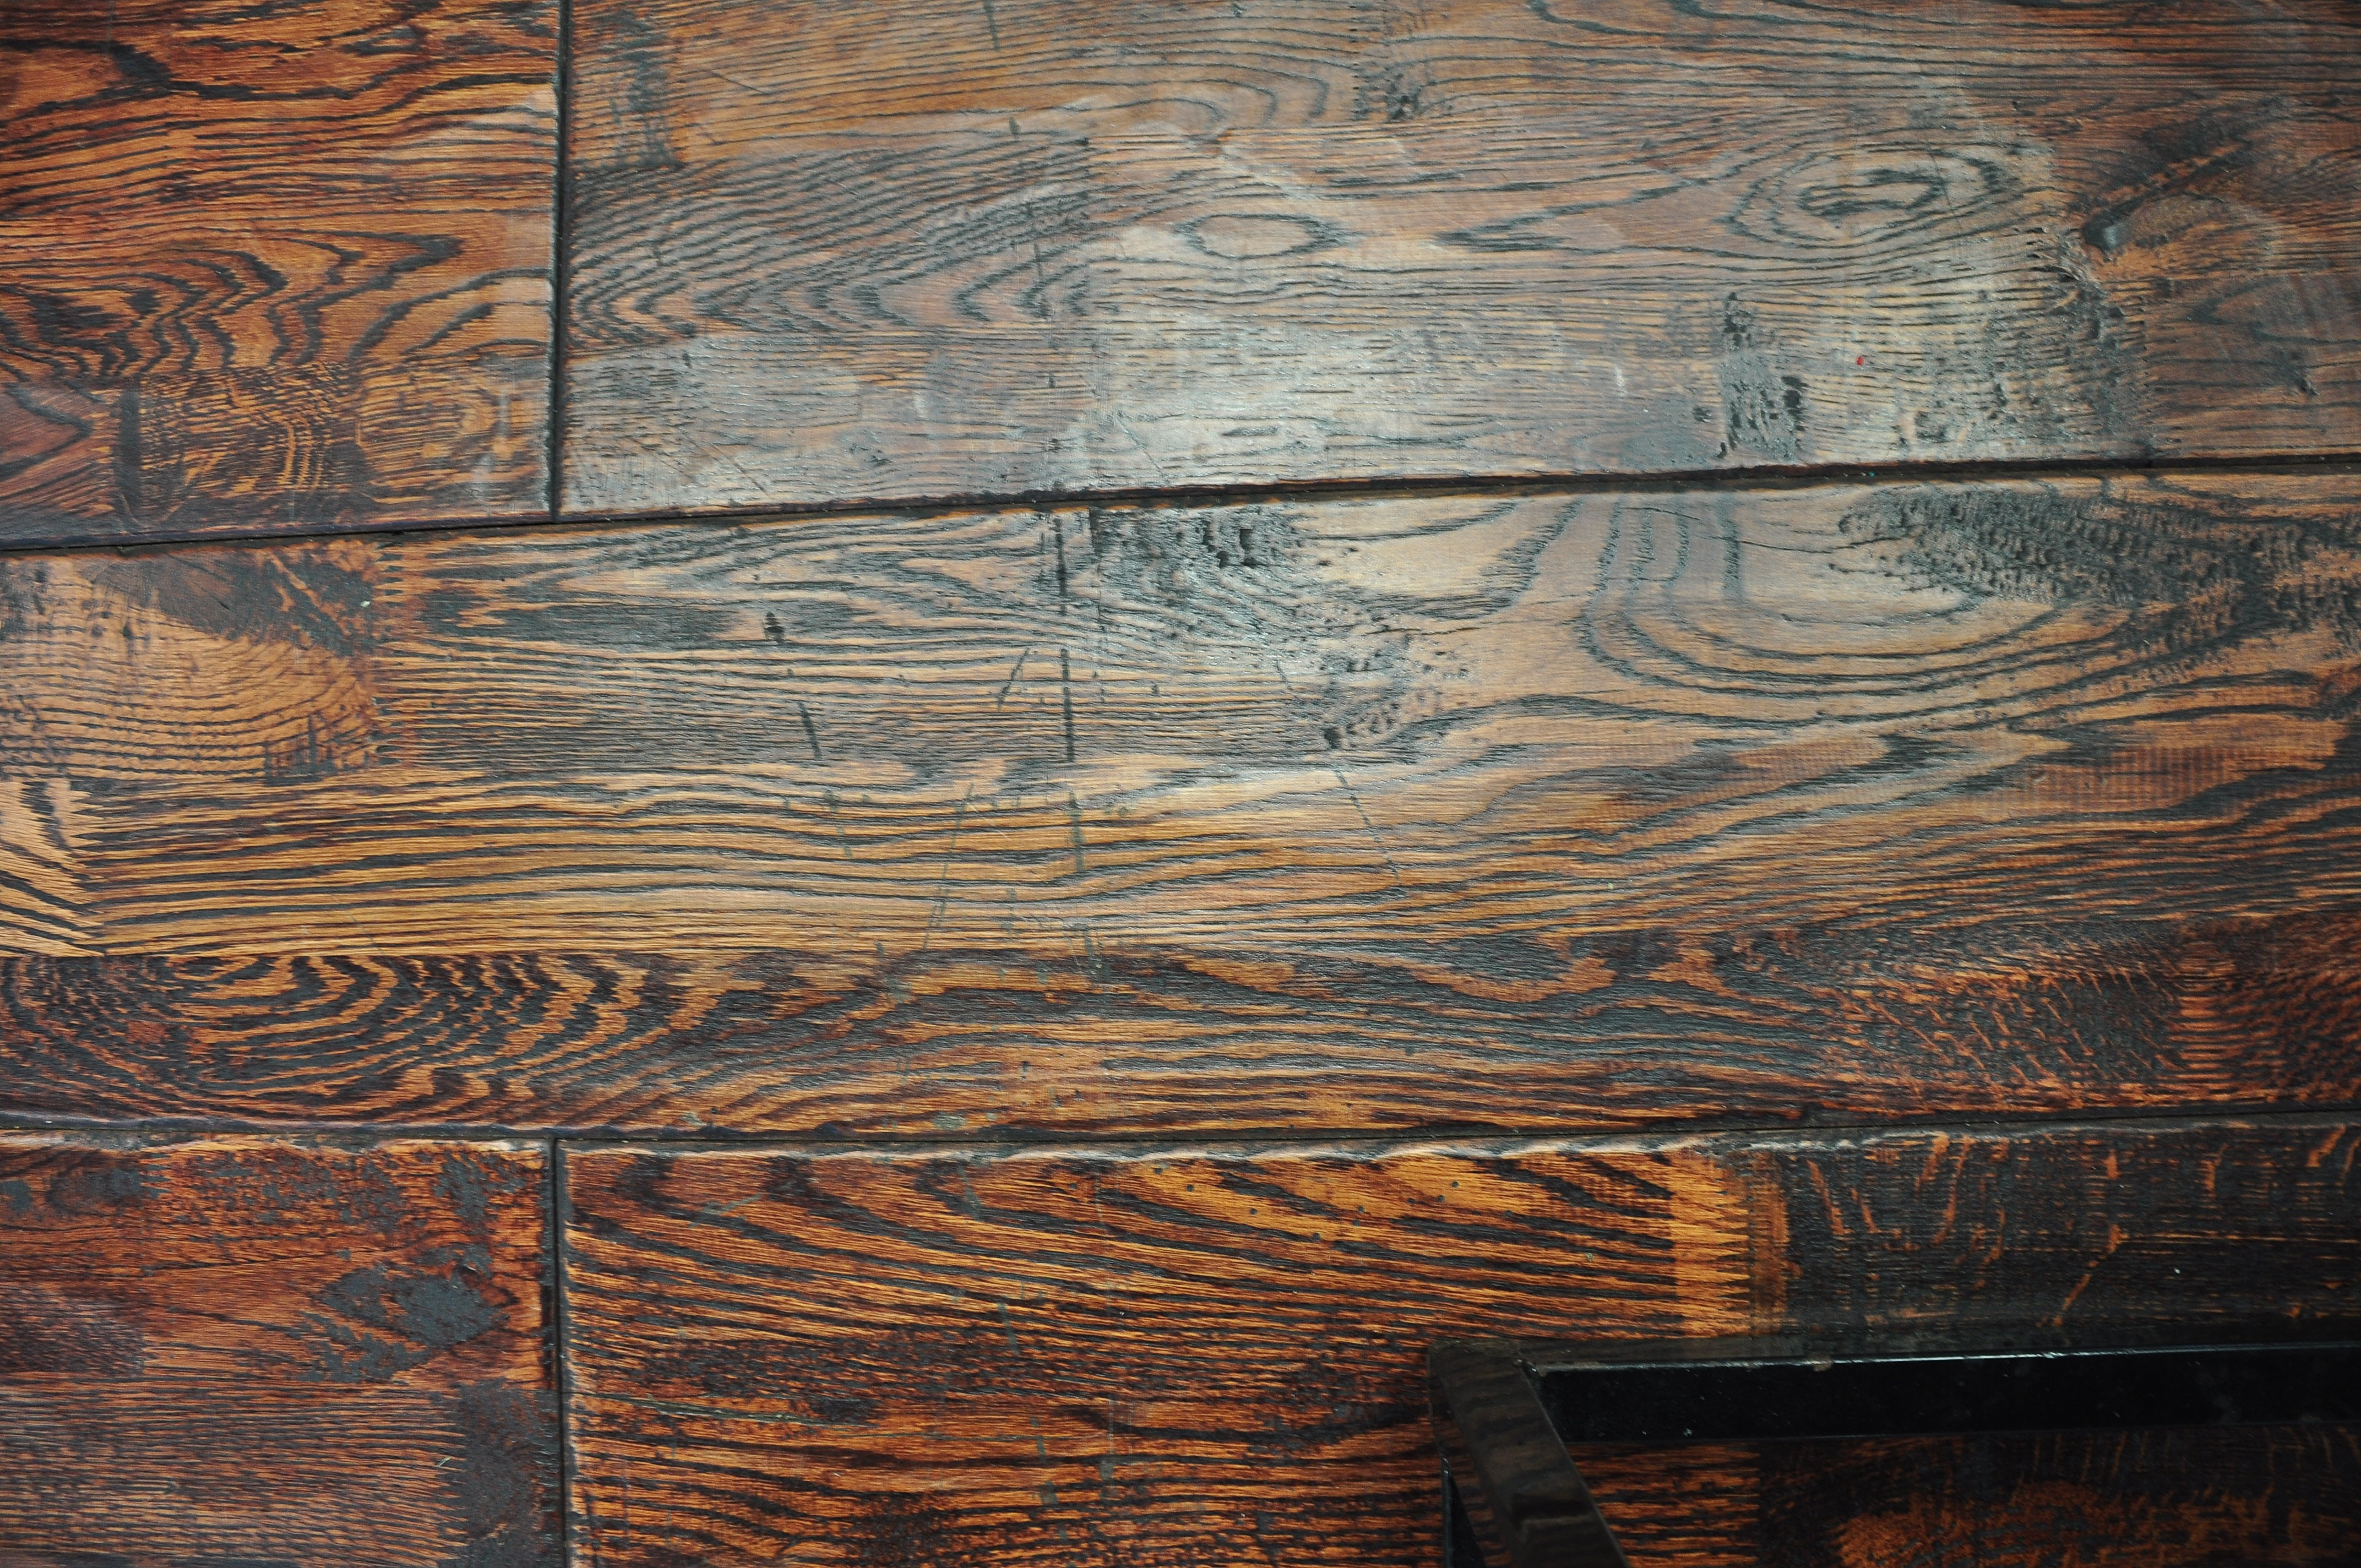 empire hardwood floor cost of 18 new how much do hardwood floors cost image dizpos com inside how much do hardwood floors cost awesome what s the deal with hand scraped hardwood floor